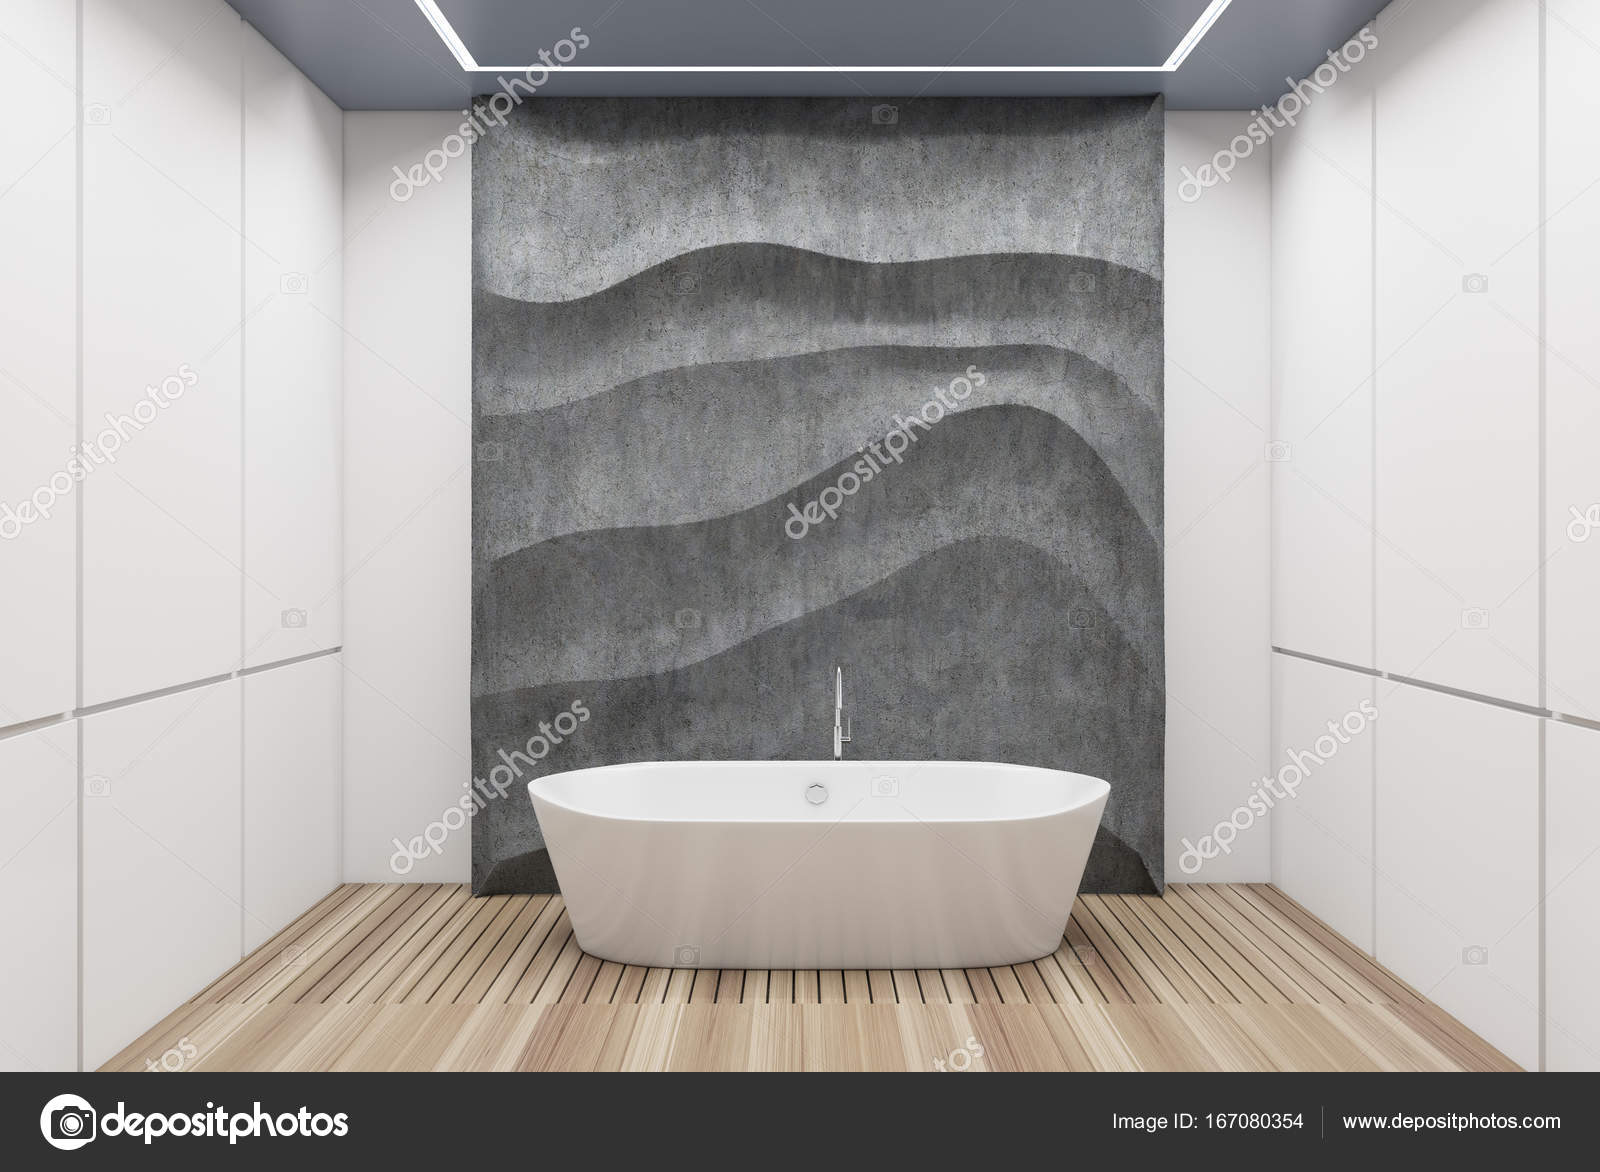 Vasca da bagno bianco e cemento bianco u foto stock